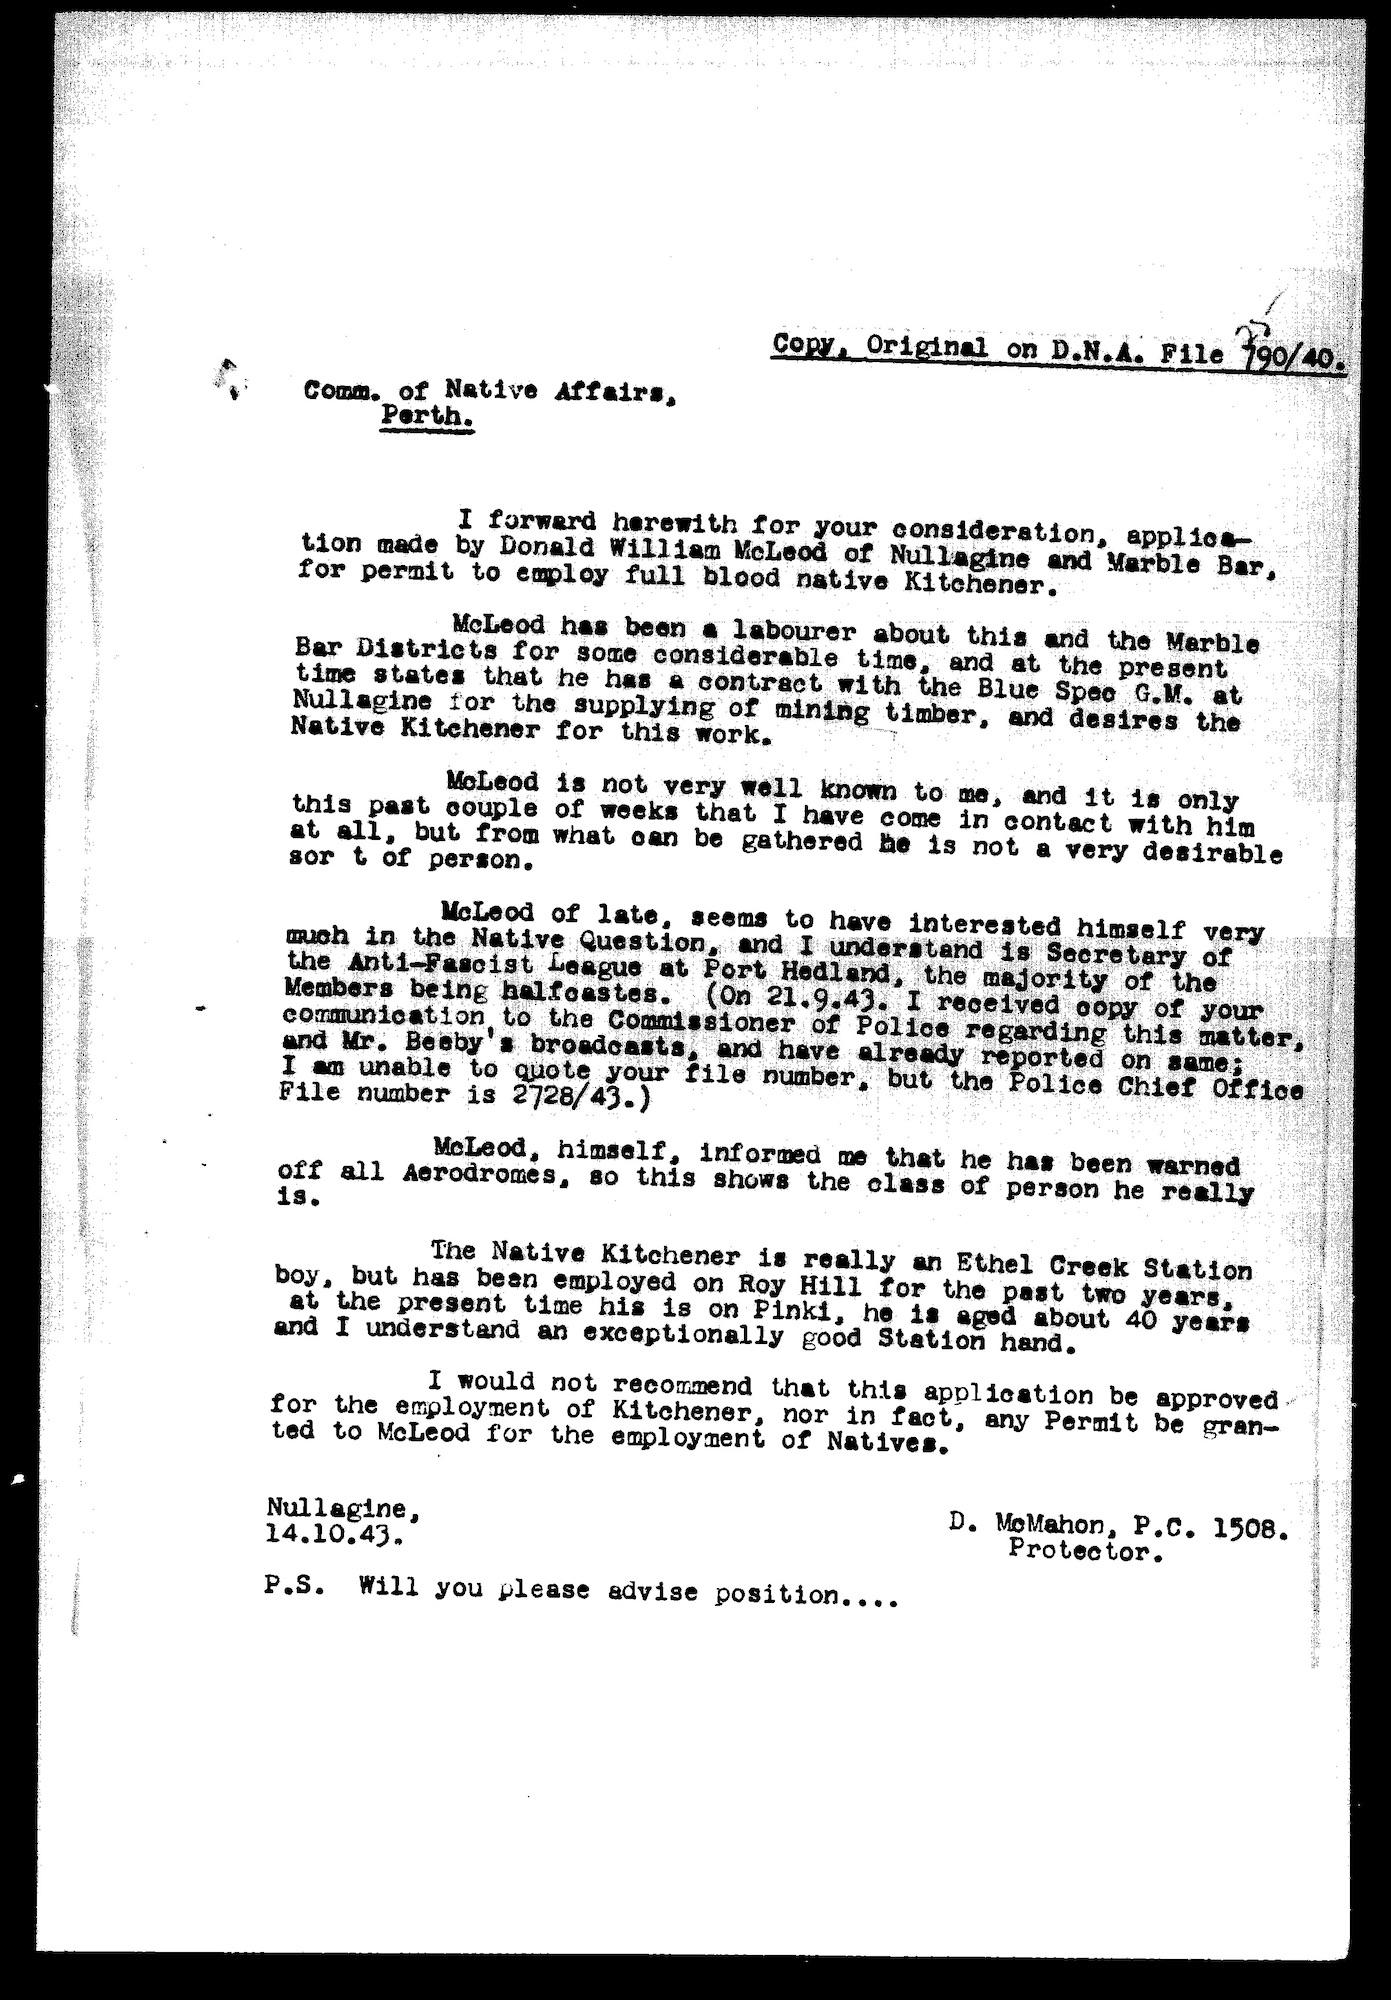 McMahon to Bray, 14 October 1943